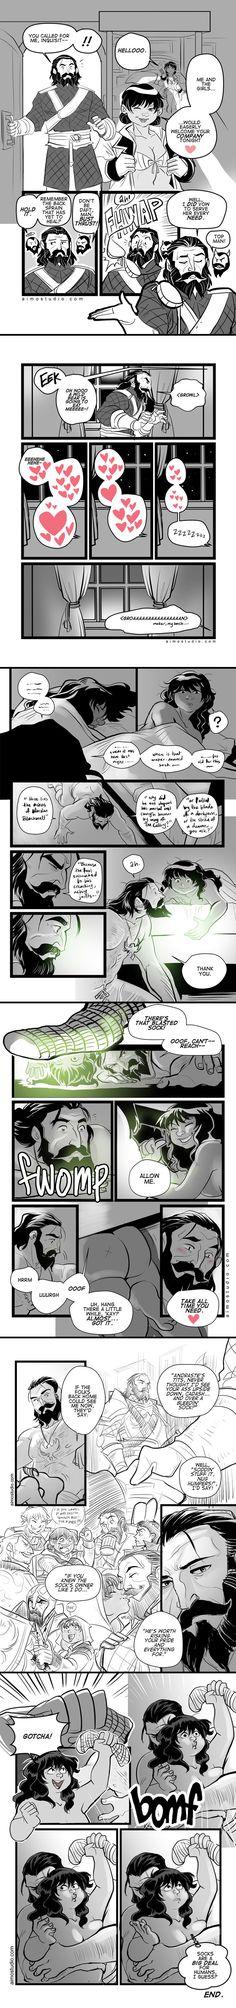 DAI - The Sock Saga by aimo on DeviantArt